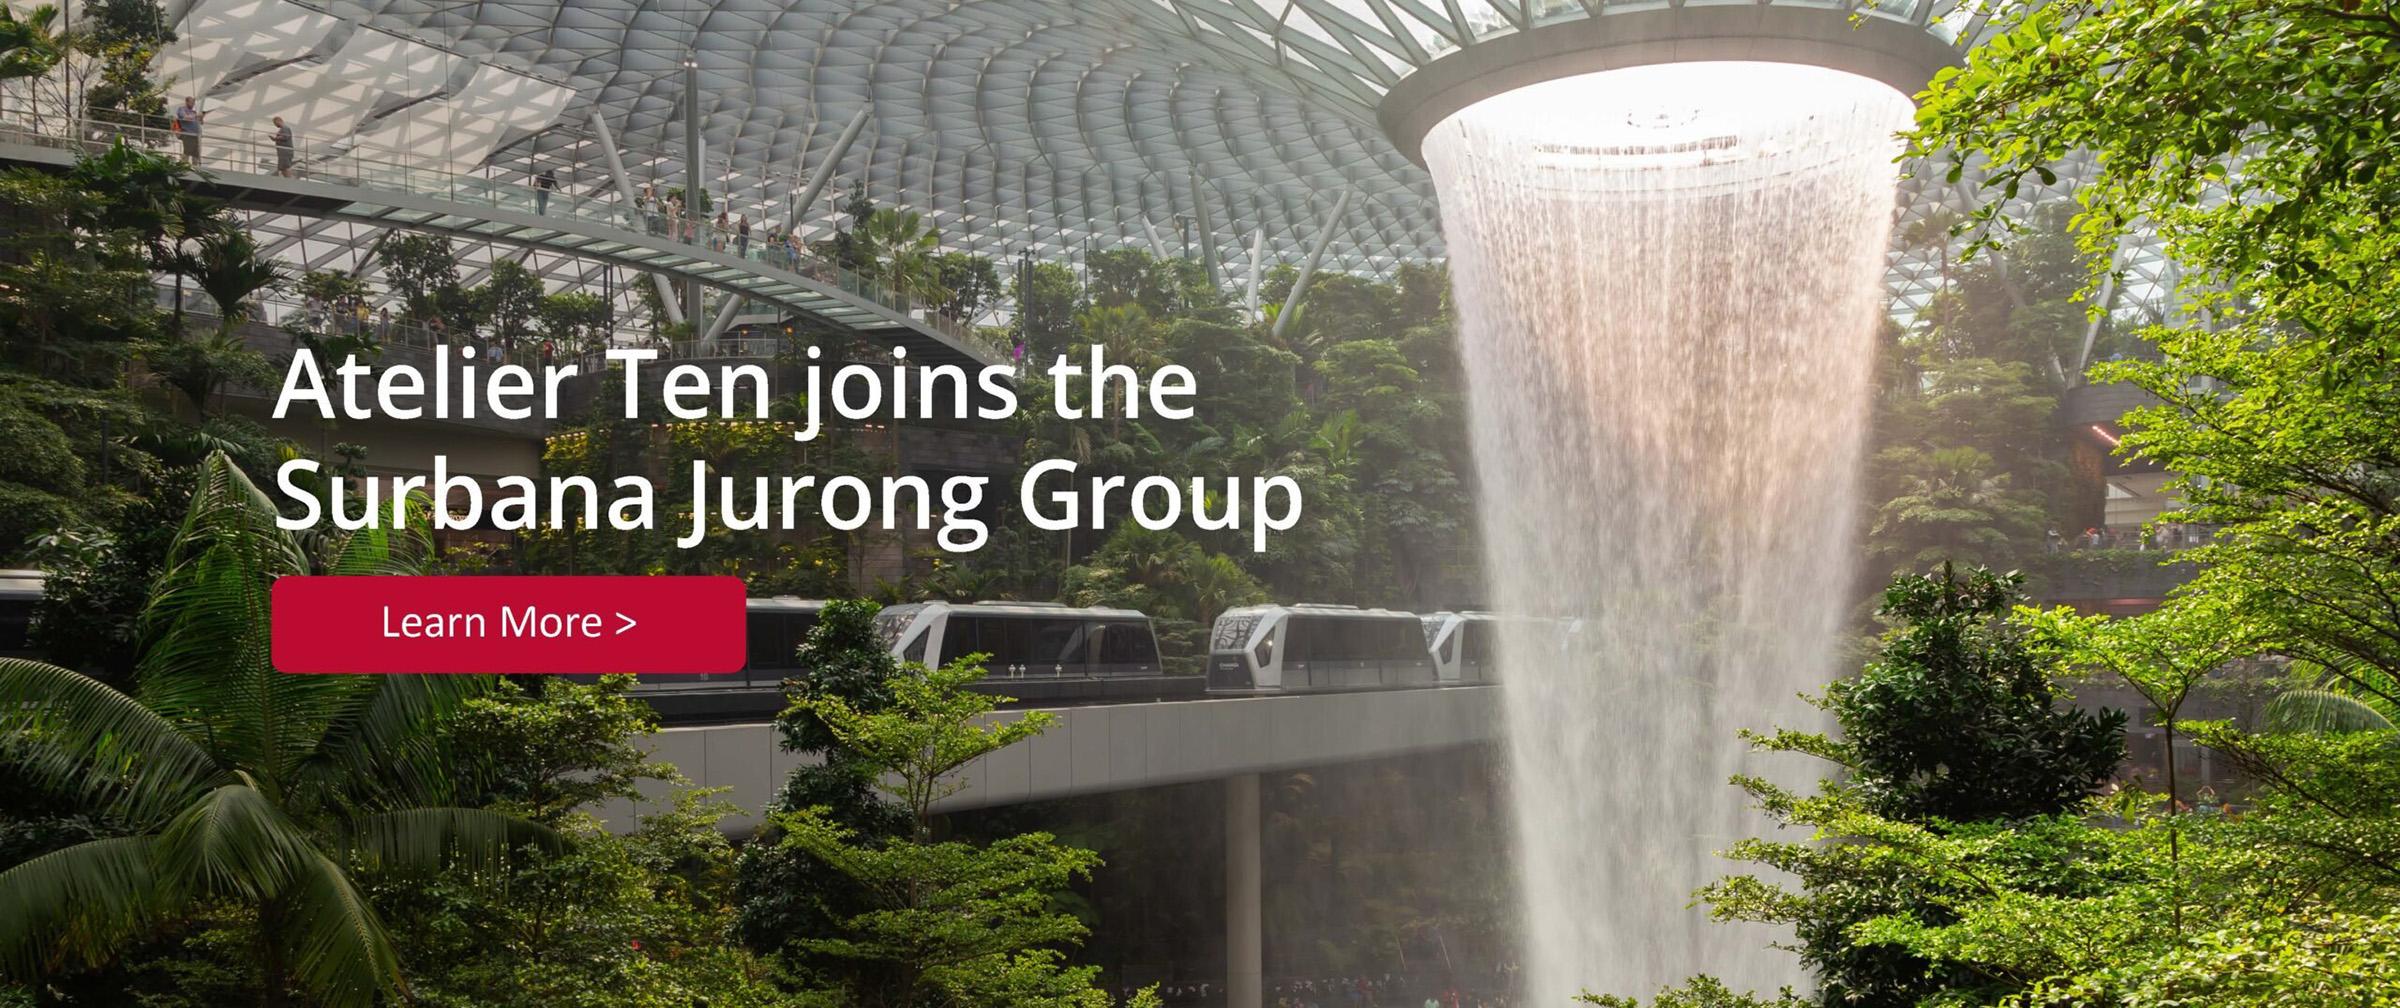 https://surbanajurong.com/resources/news/environmental-design-consultancy-atelier-ten-joins-the-surbana-jurong-group/